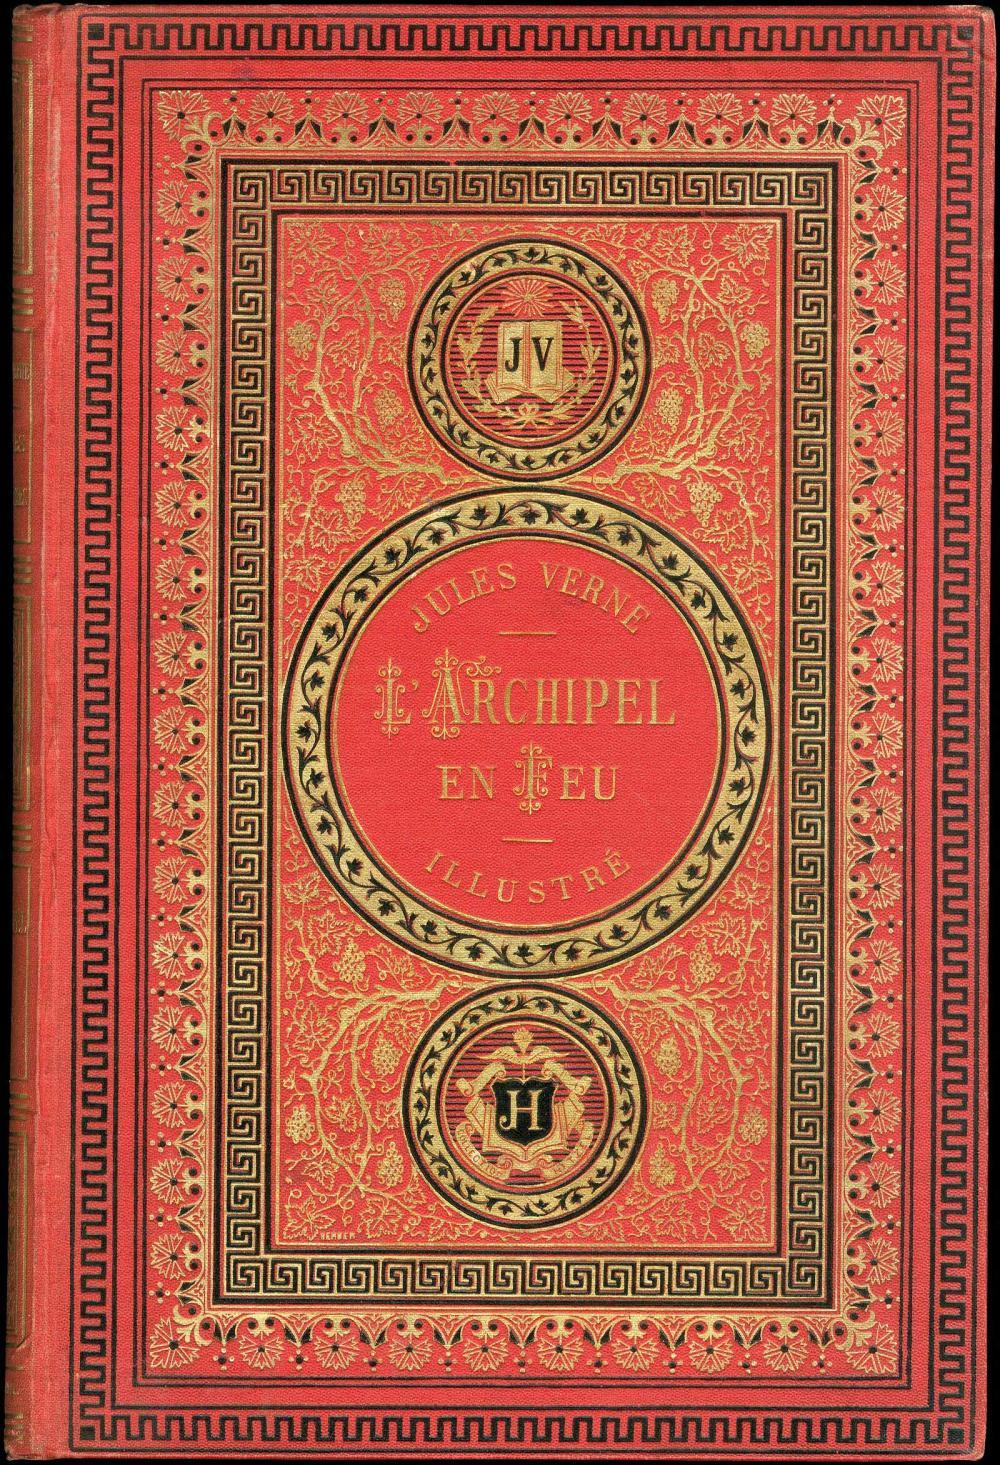 VERNE JULES, Ιούλιος ΒΕΡΝ, «LArchipel en feu» [Το Αιγαίο στις Φλόγες], Paris, Hetzel (1884).... - Greece - PHILHELLENISM /